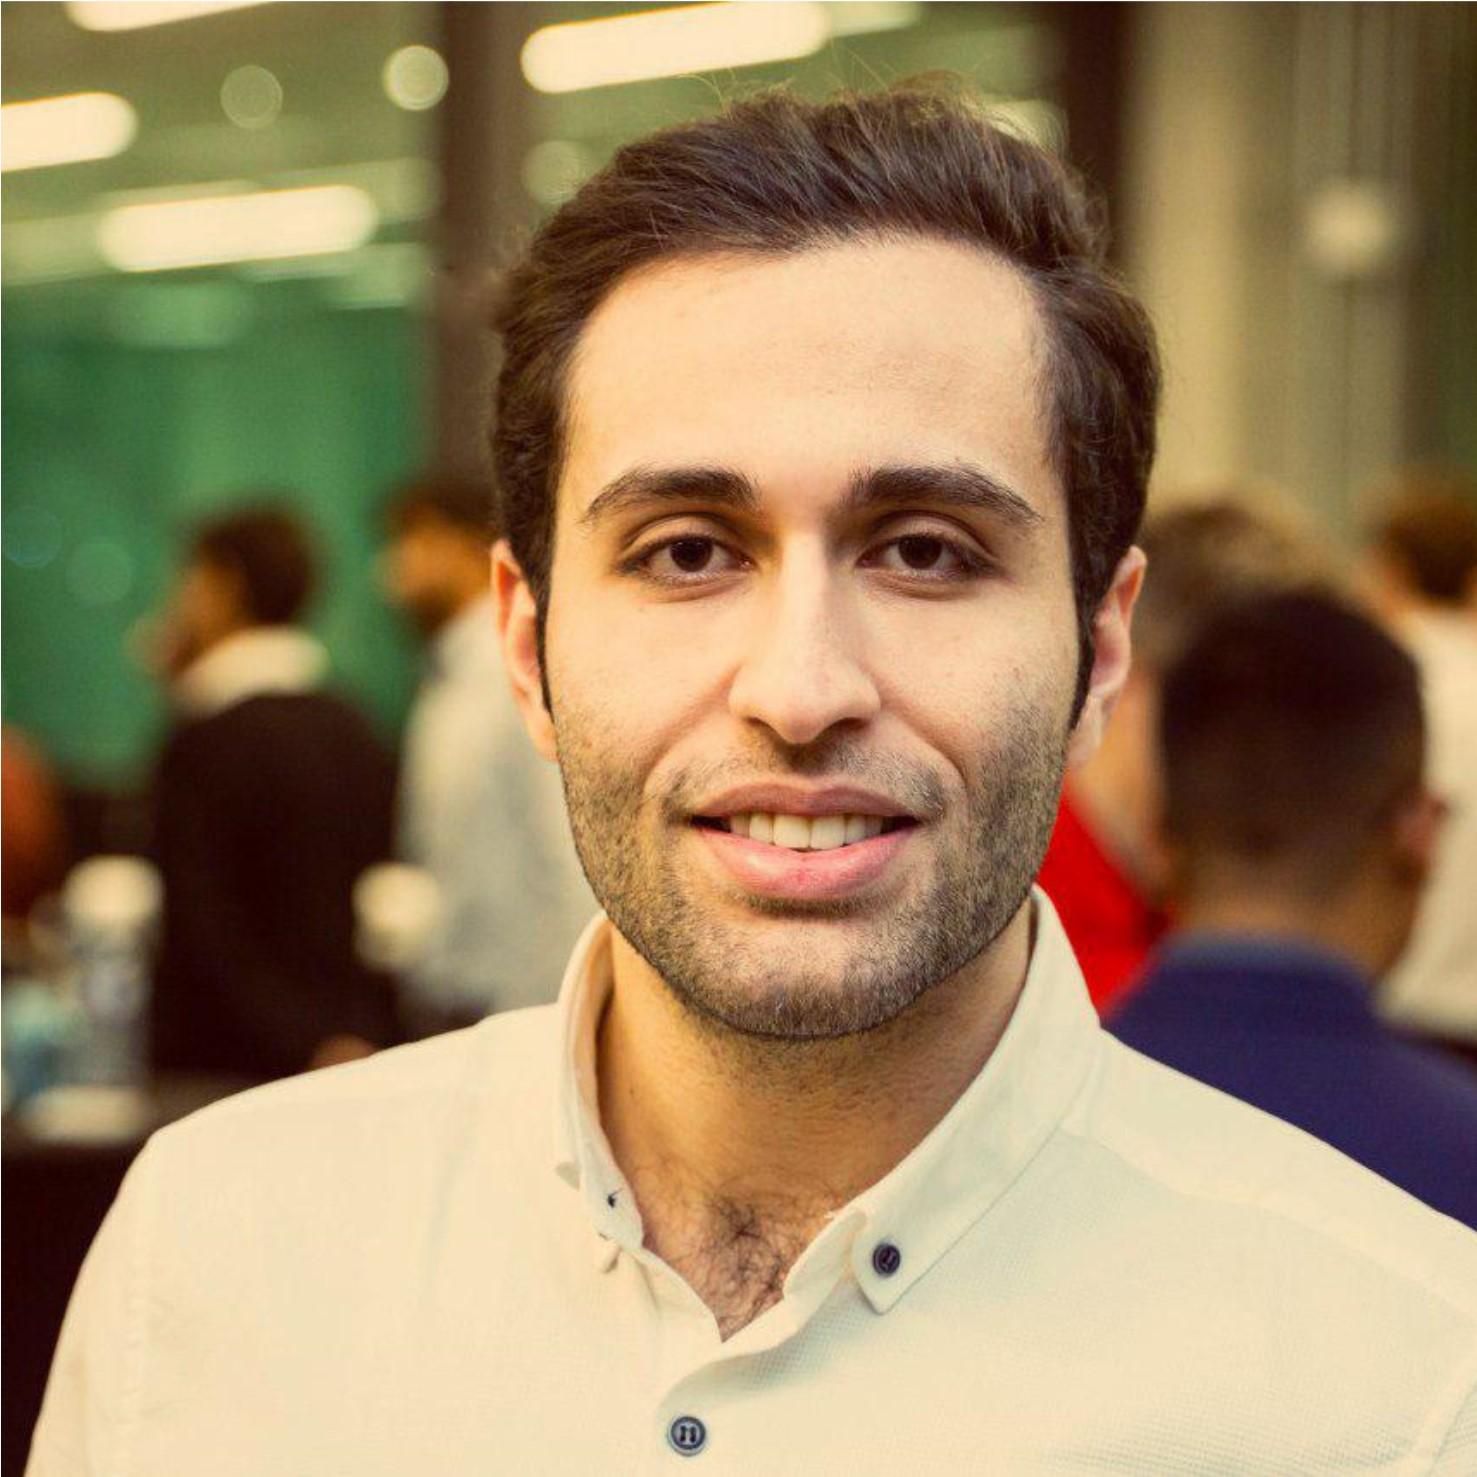 Mohammad Ghodratigohar